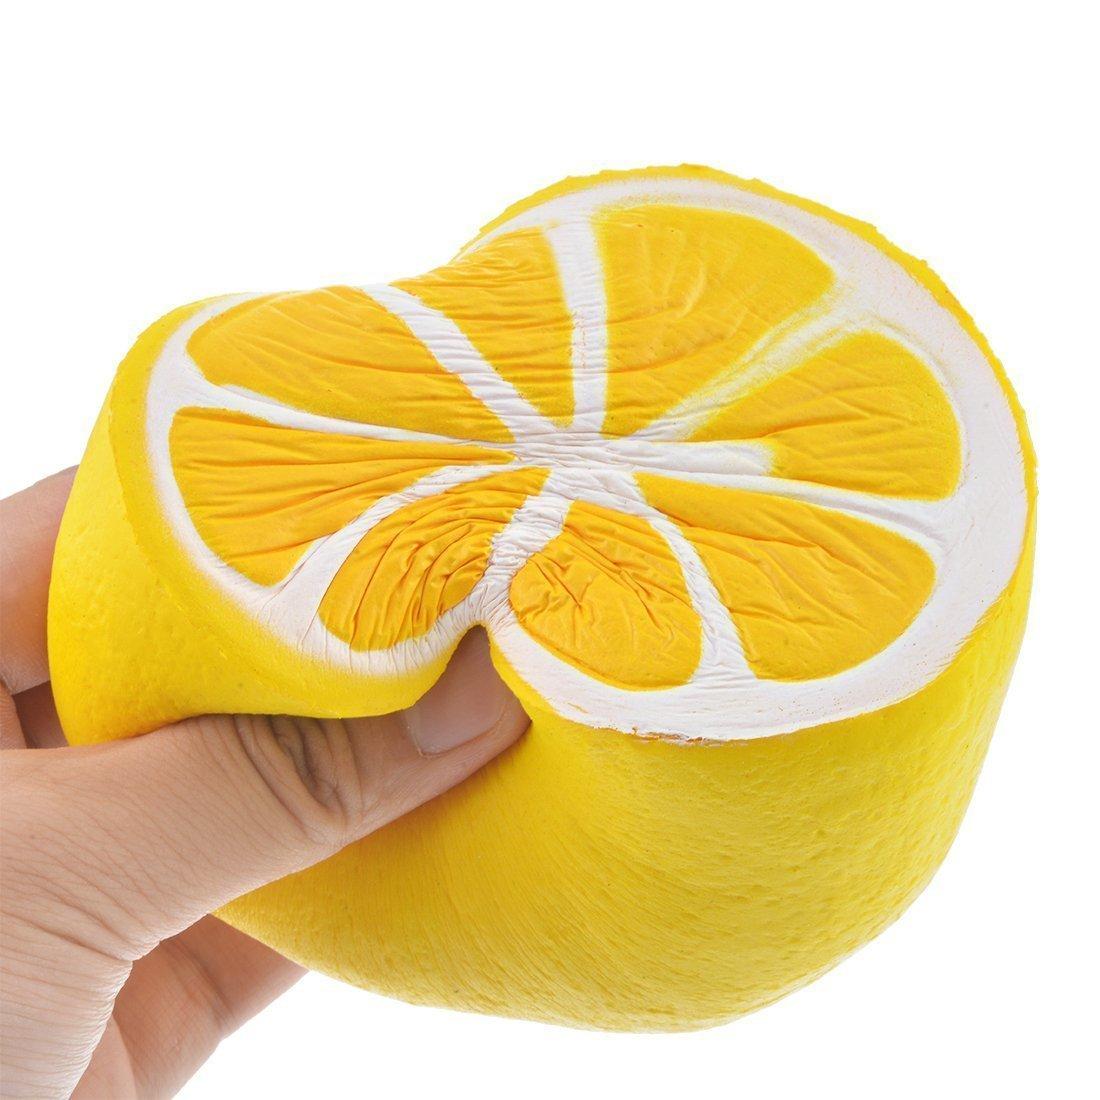 I Love Squishy: Lemon Squishie Toy (10cm) image